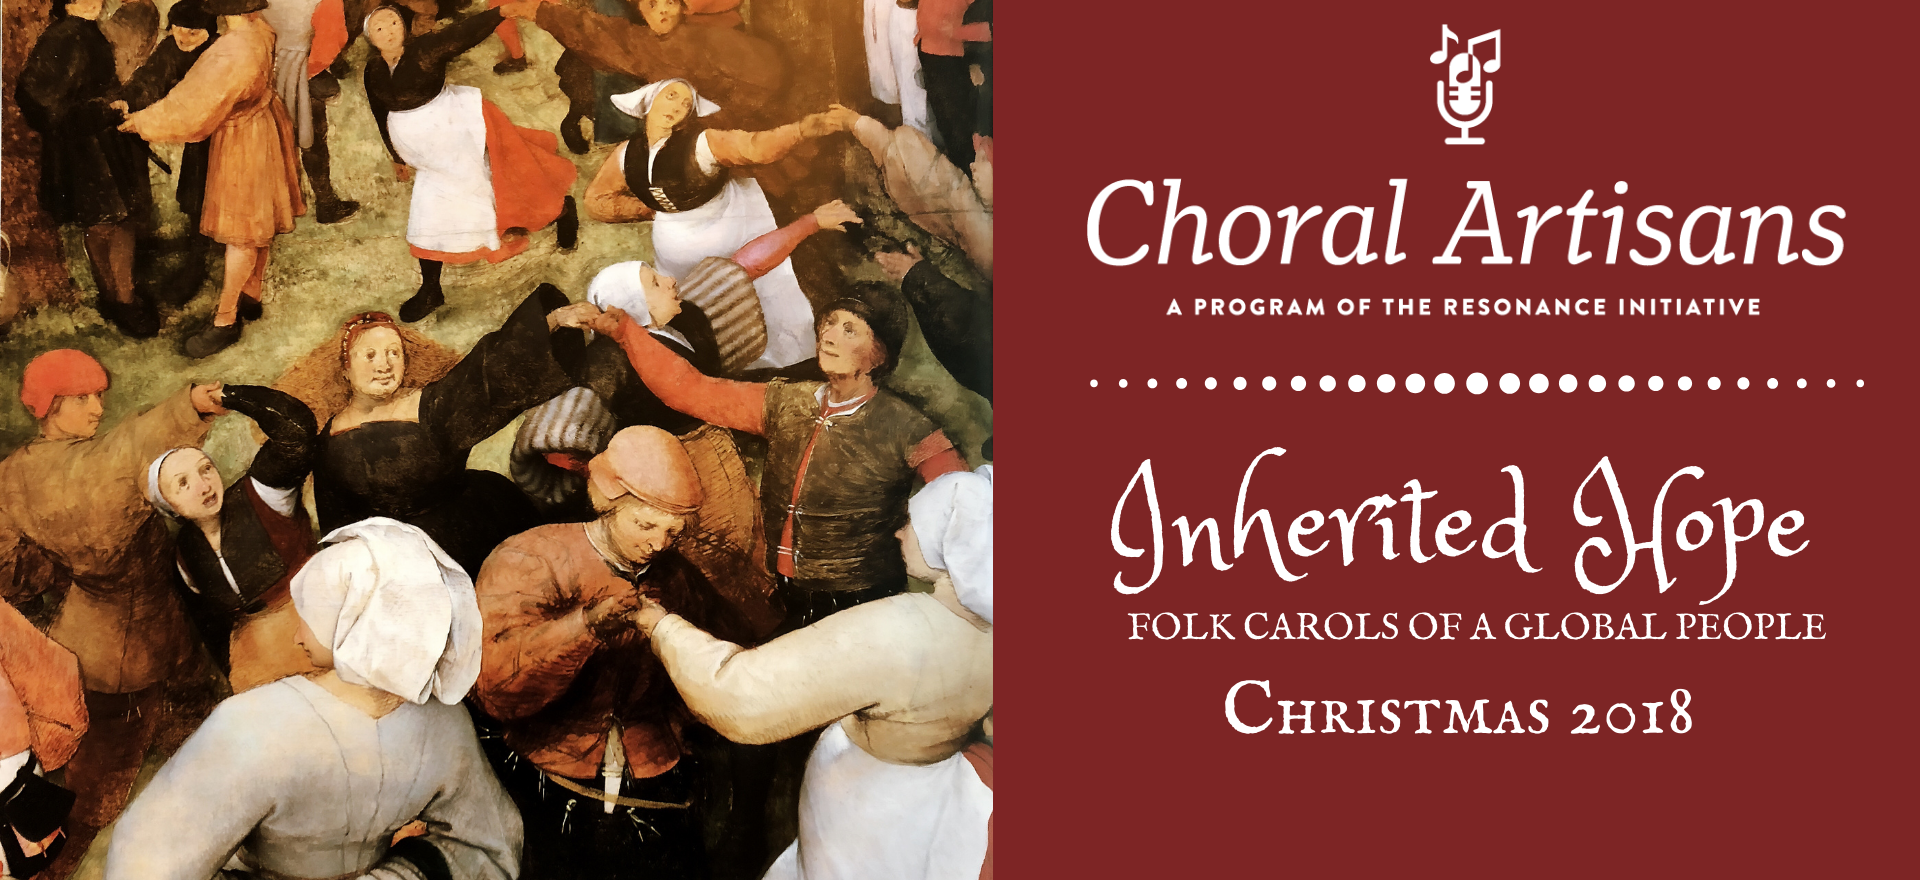 Choral Artisans - Christmas 2018